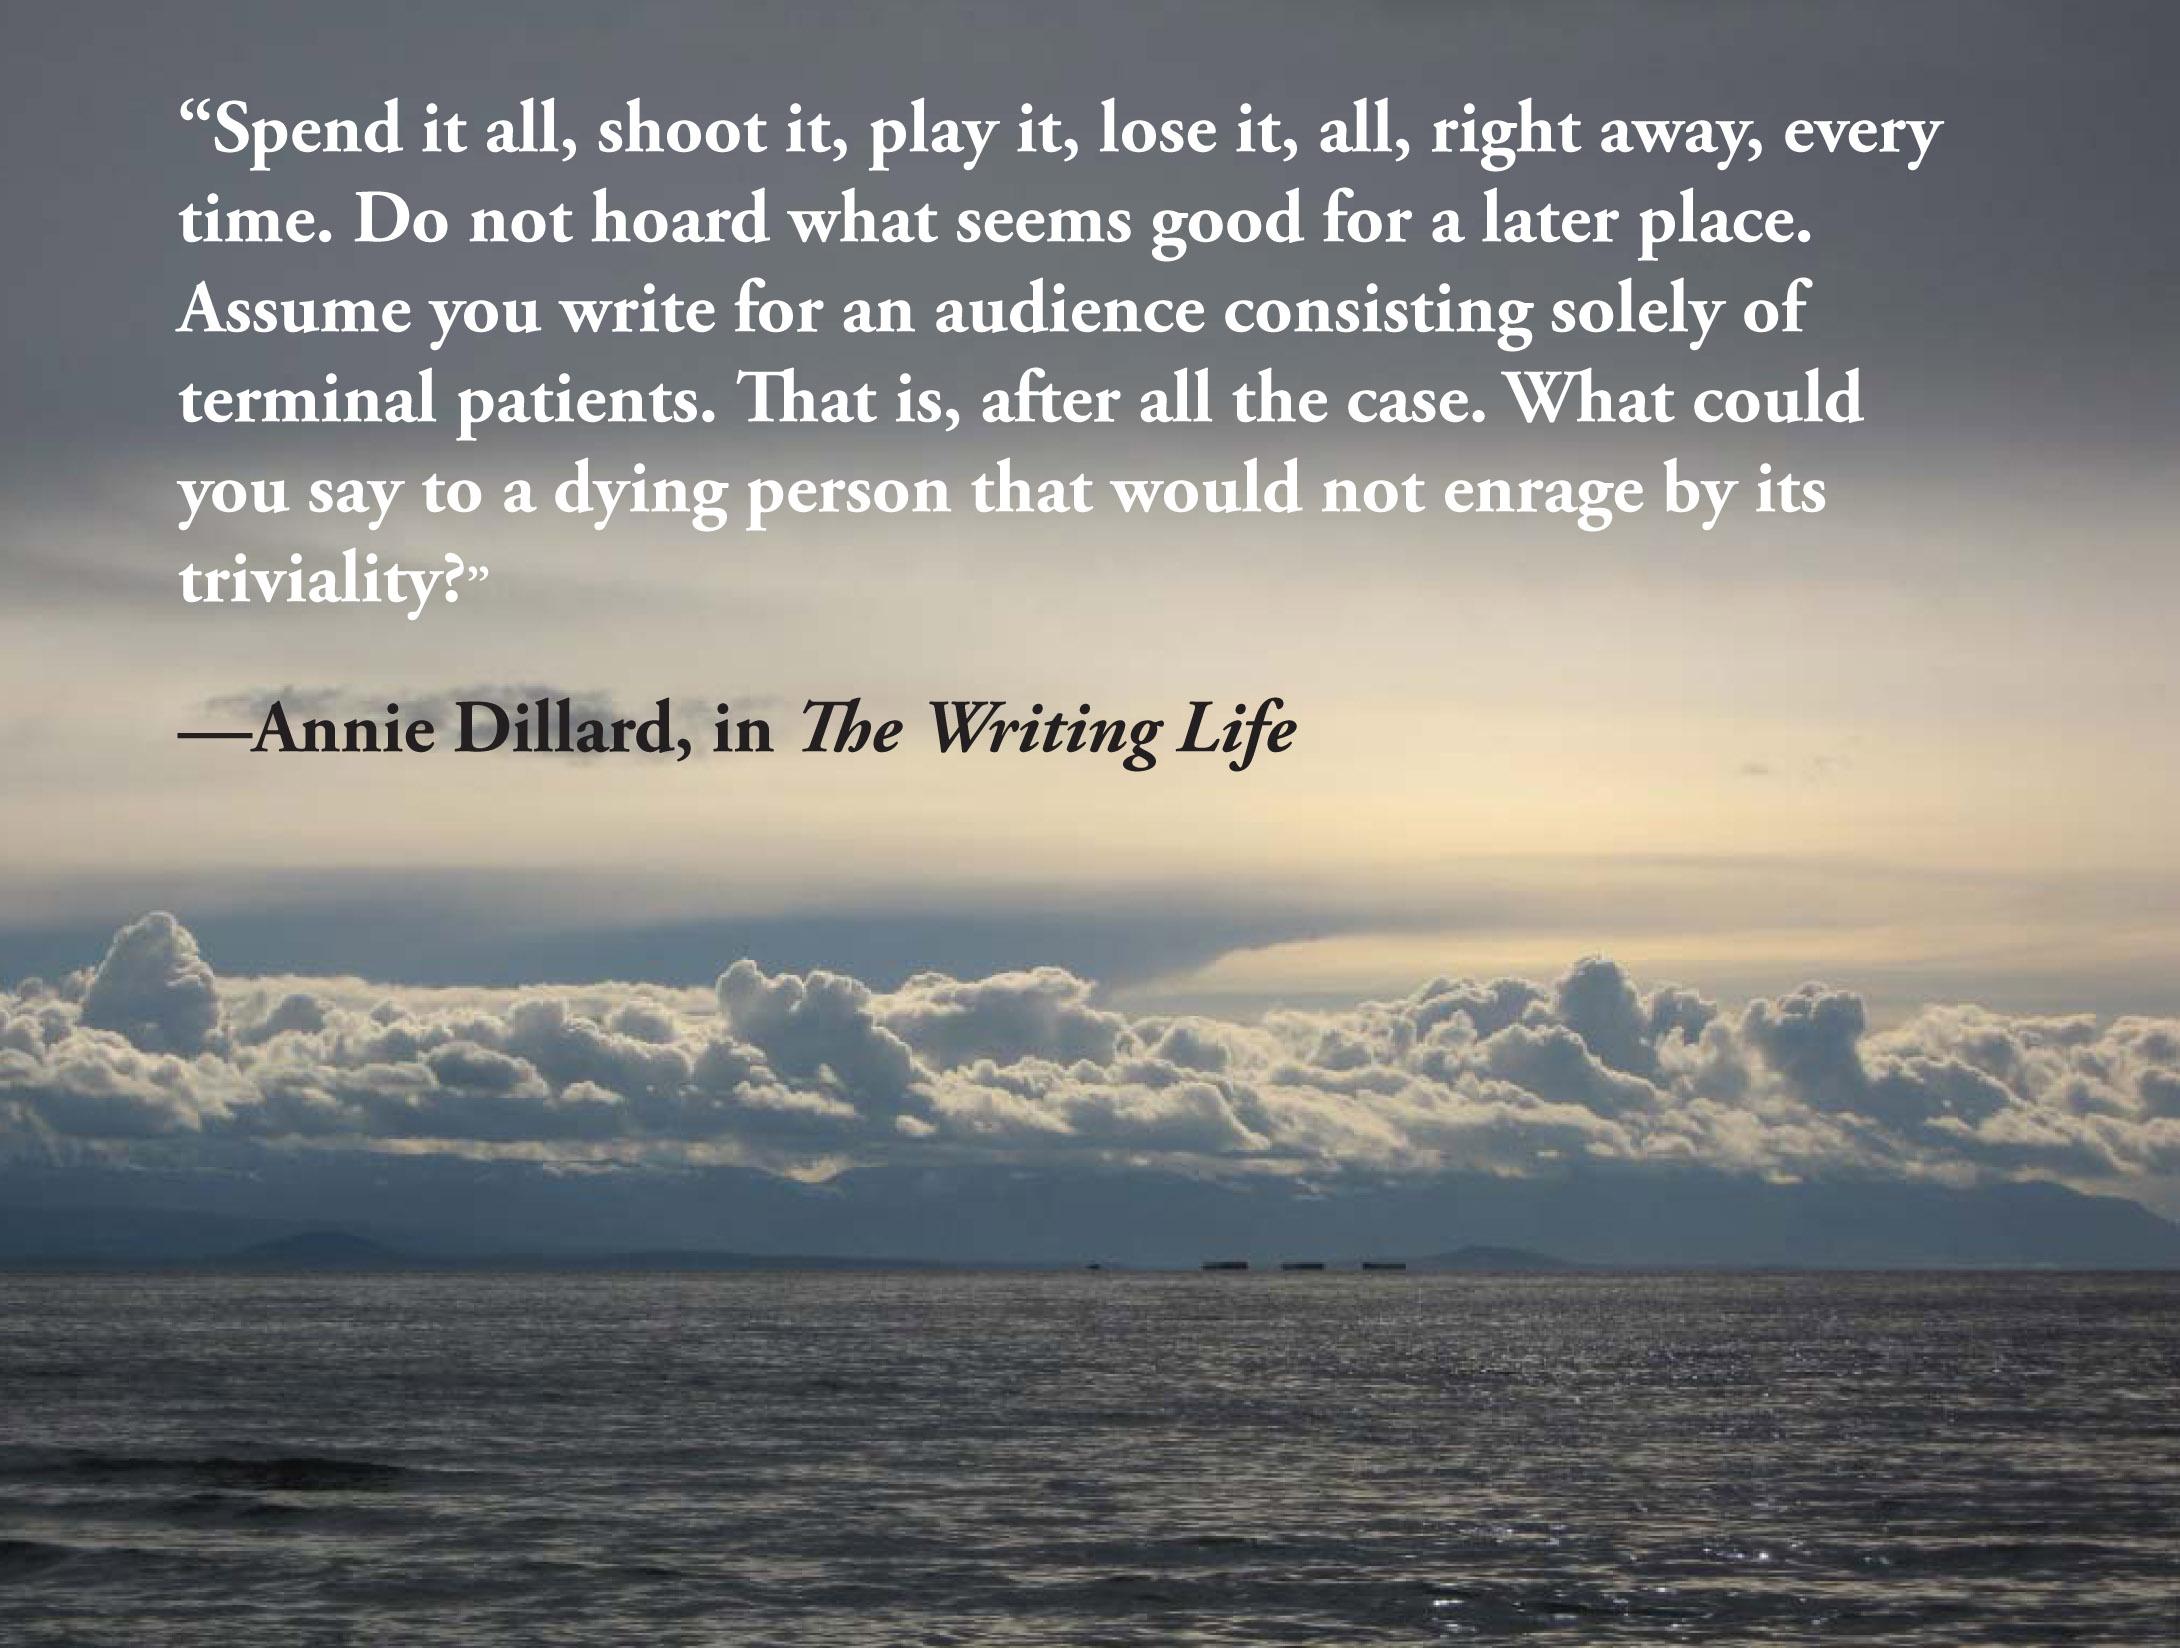 the writing life annie dillard summary